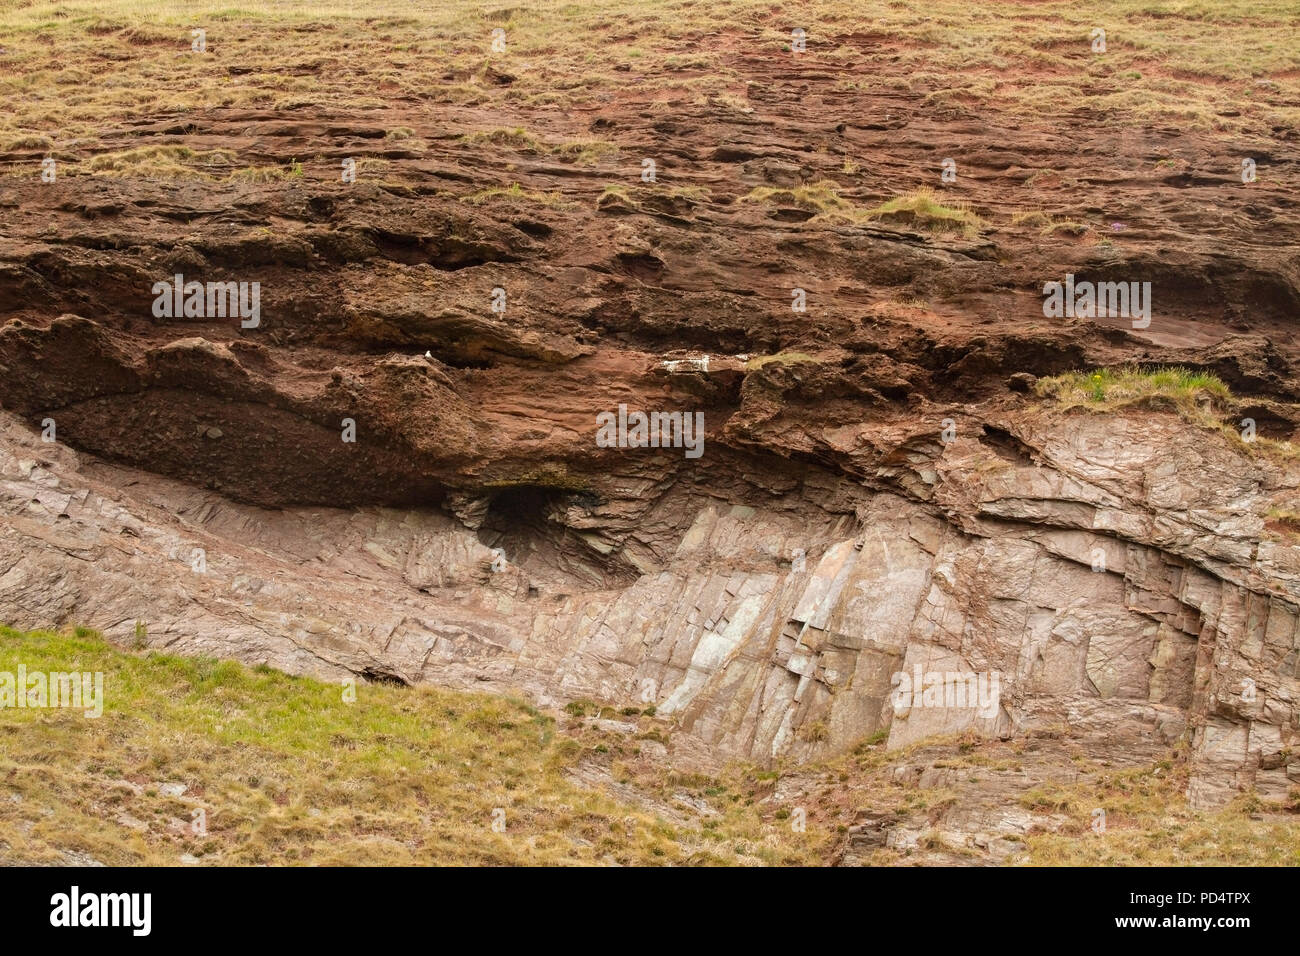 view of Hutton's unconformity at Siccar Point, near Edinburgh, Scotland - Stock Image